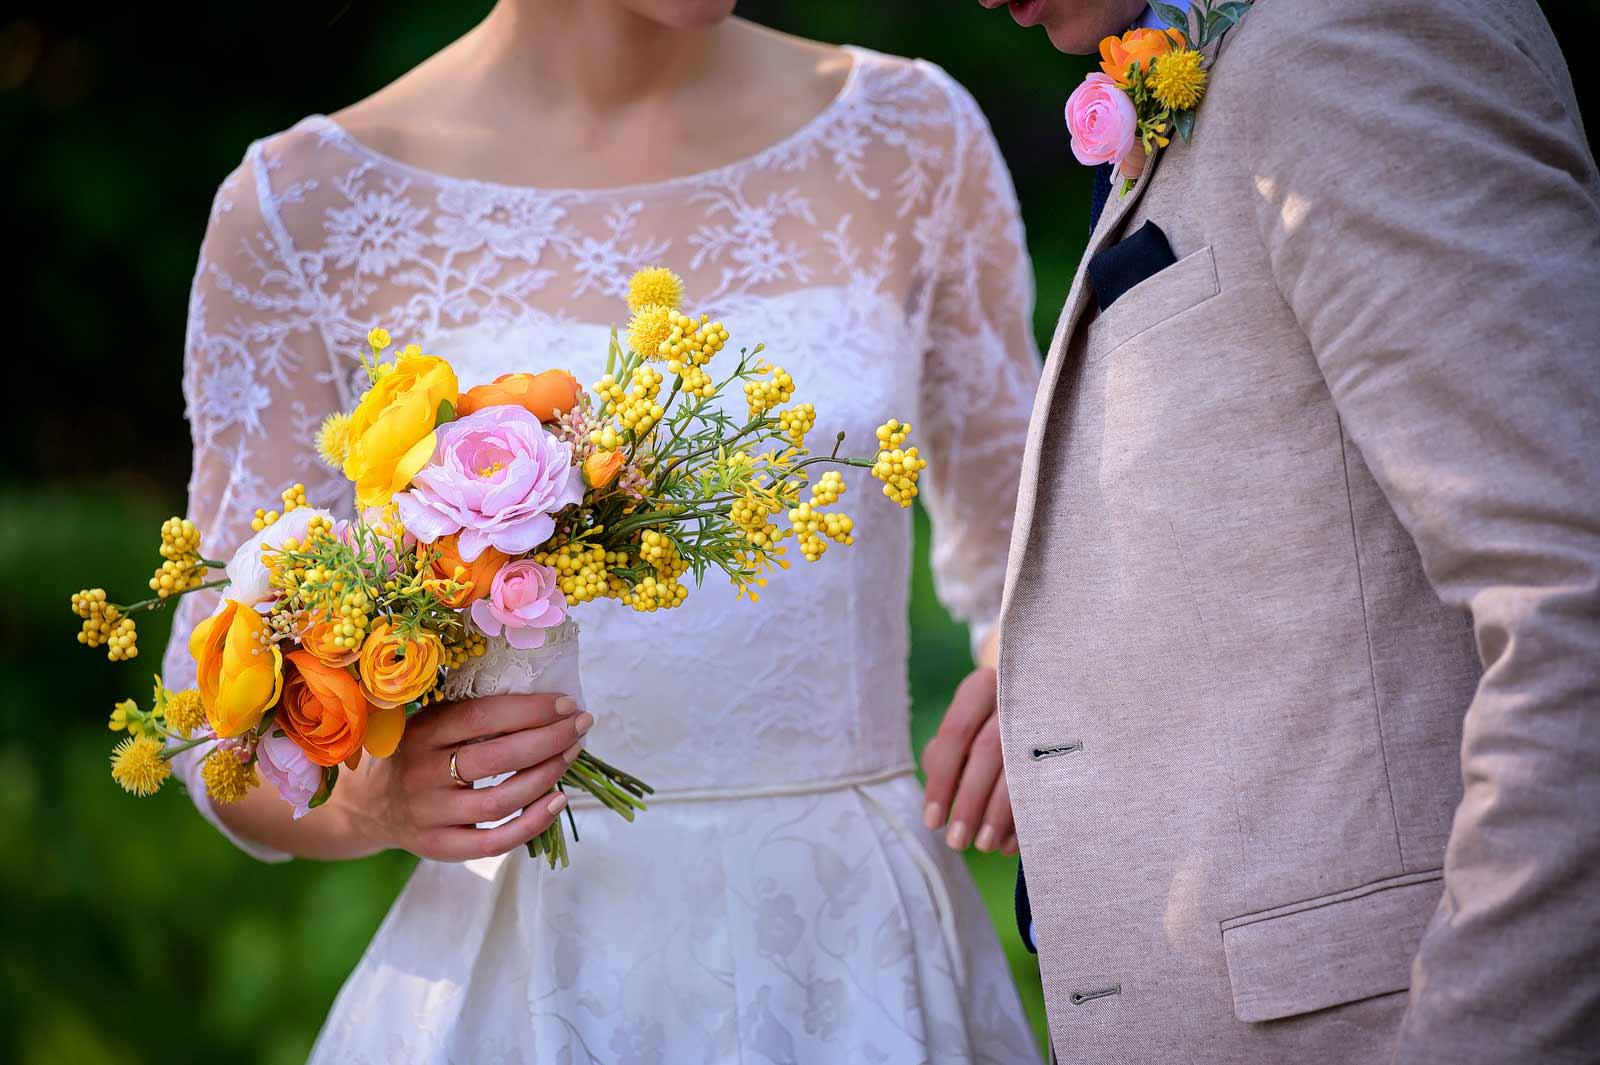 rebeccatrevor-wedding-sneakpeek-12